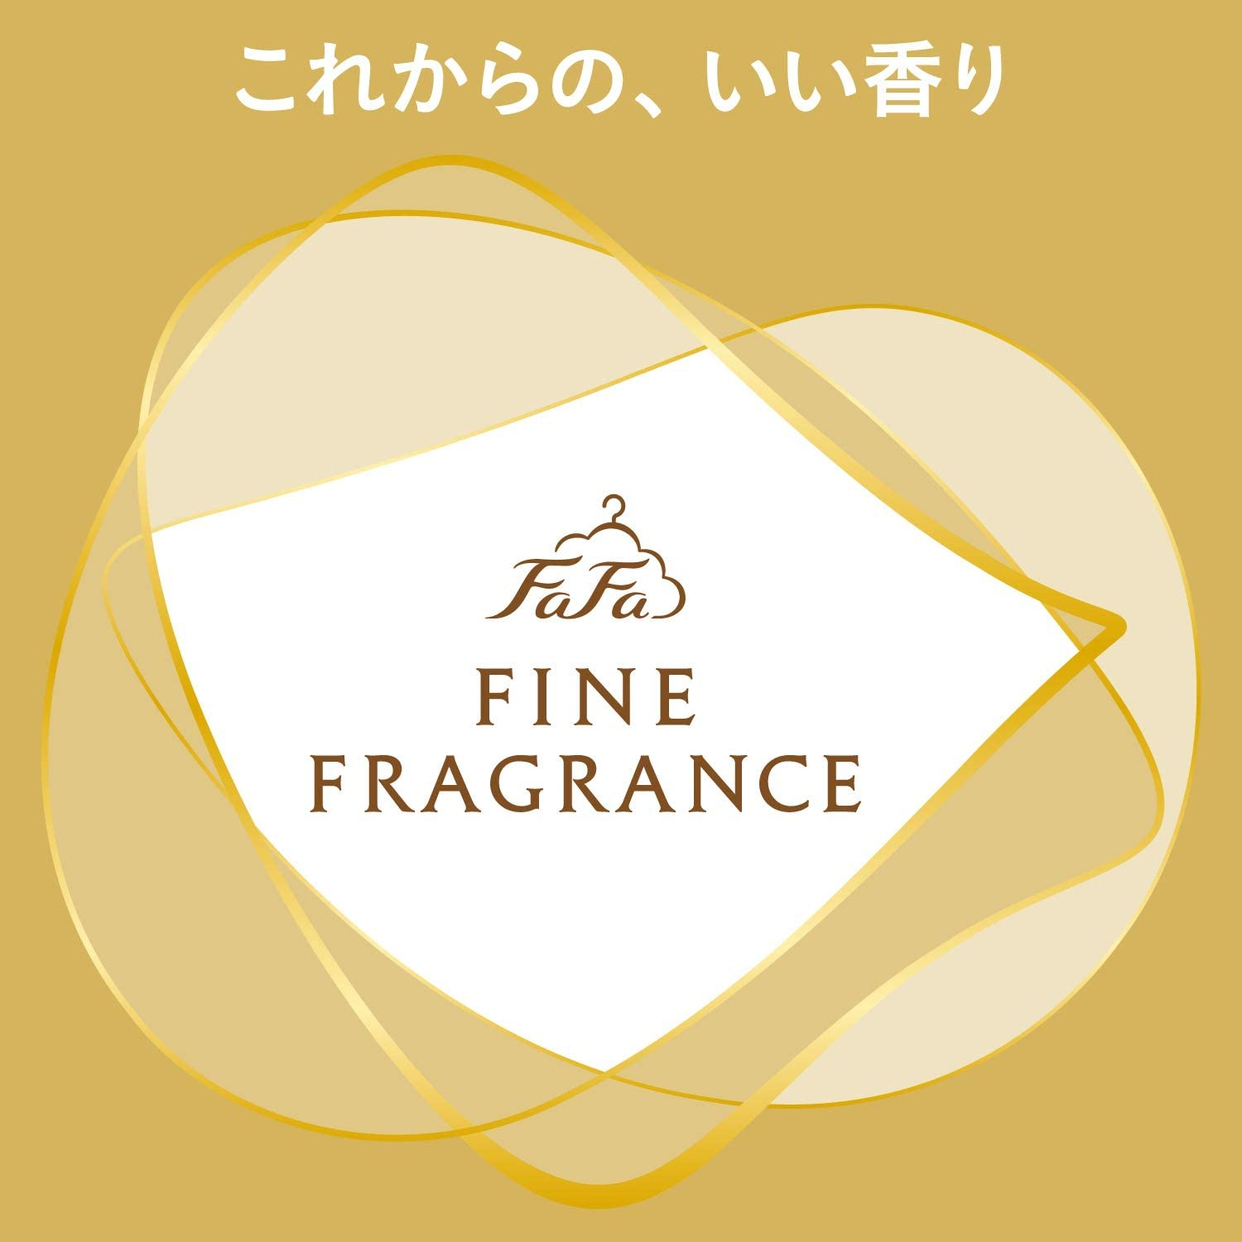 FaFa(ファーファ) ファインフレグランスの商品画像2